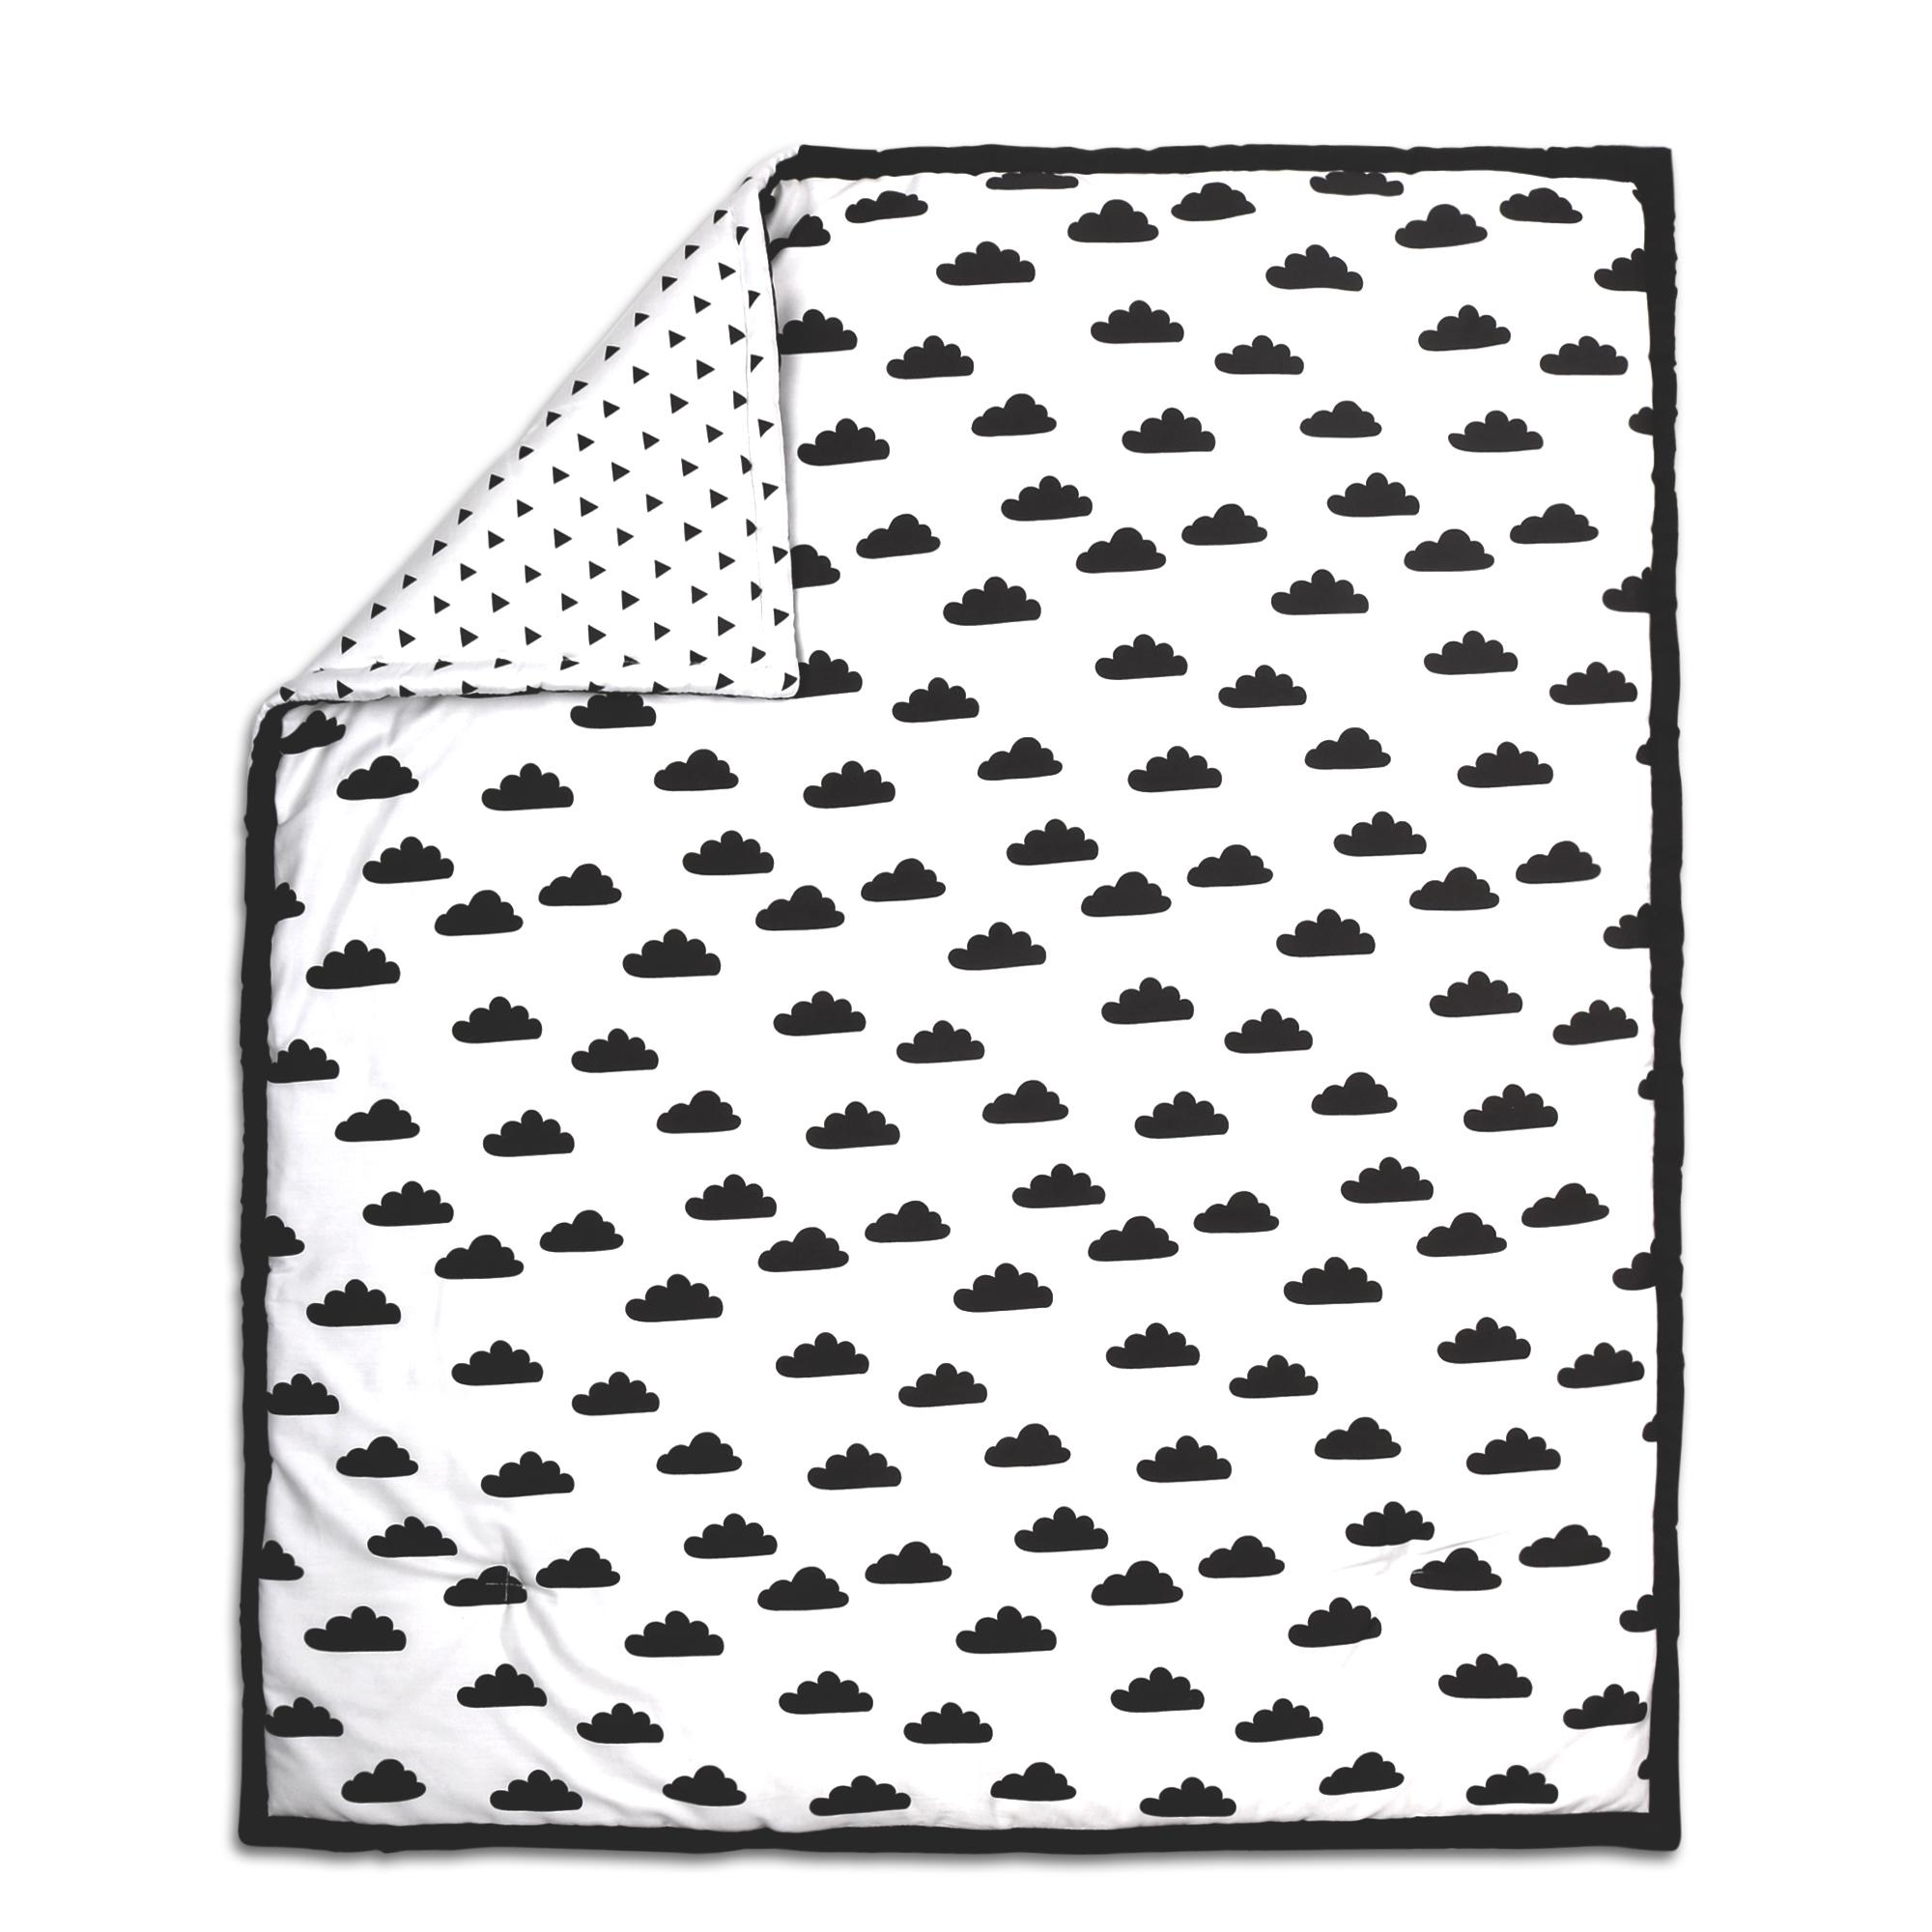 Cloud Print Cotton Quilt in Black & White